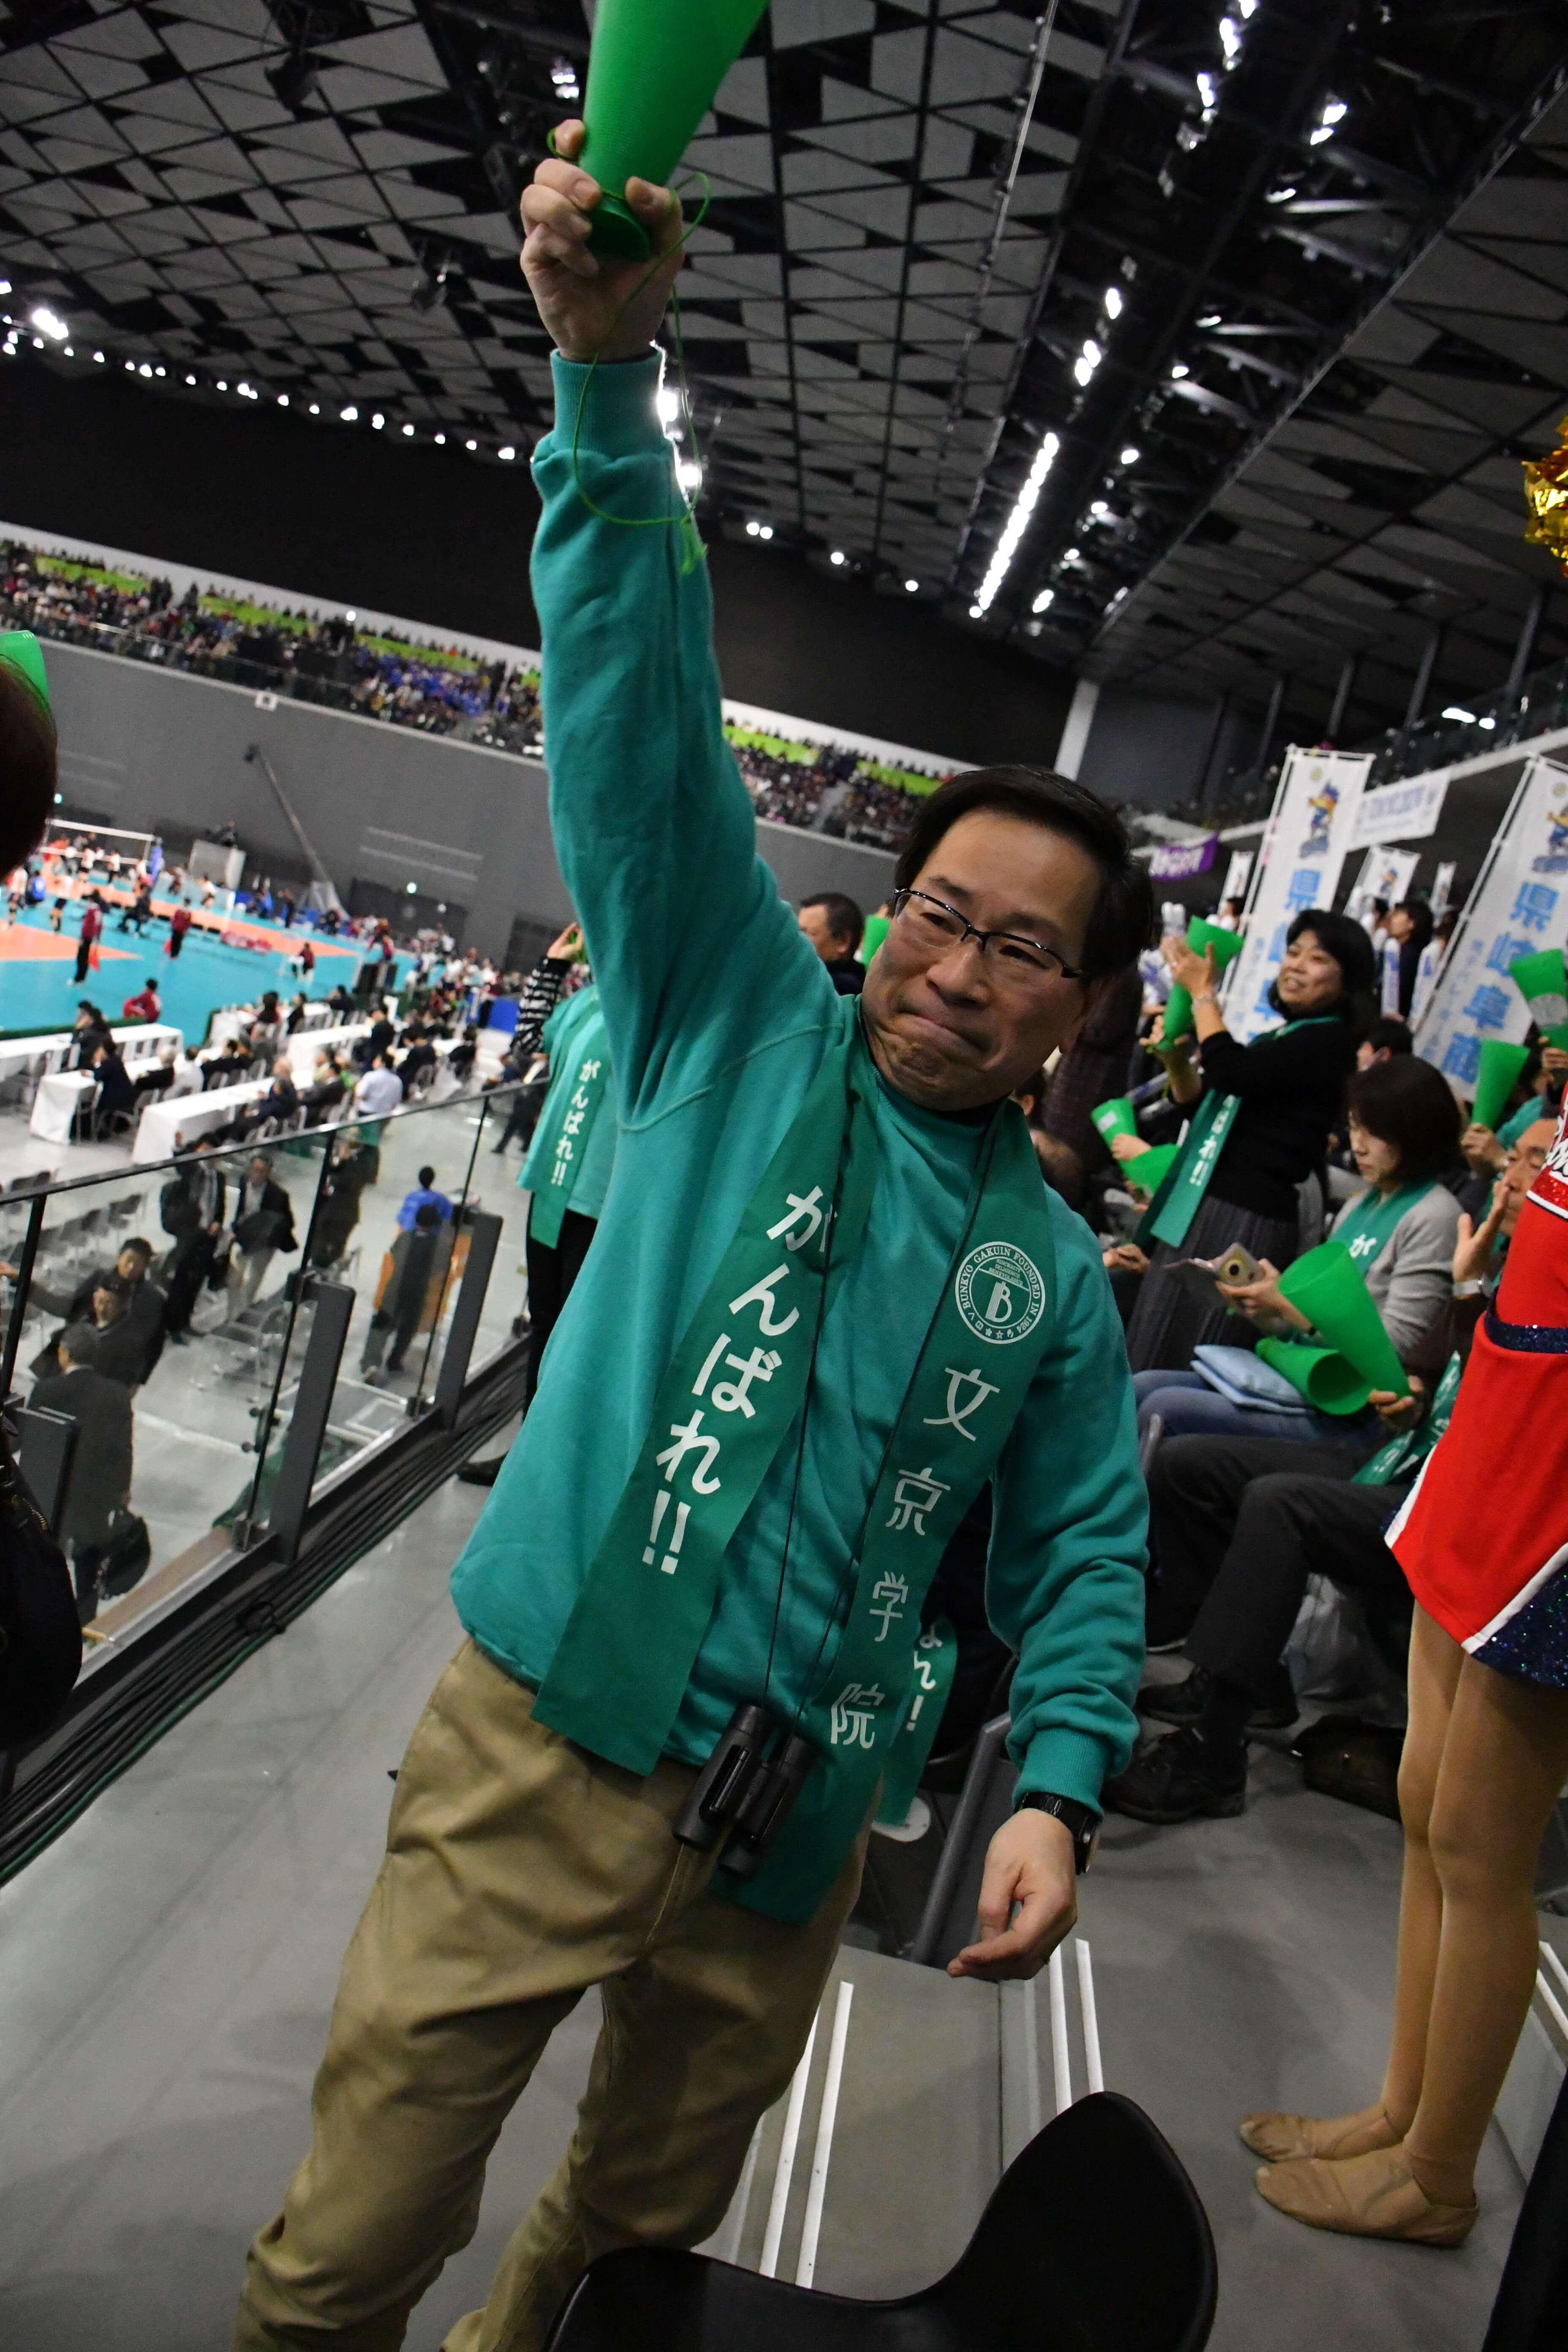 190106 Haruko Volley2nd (64).JPG